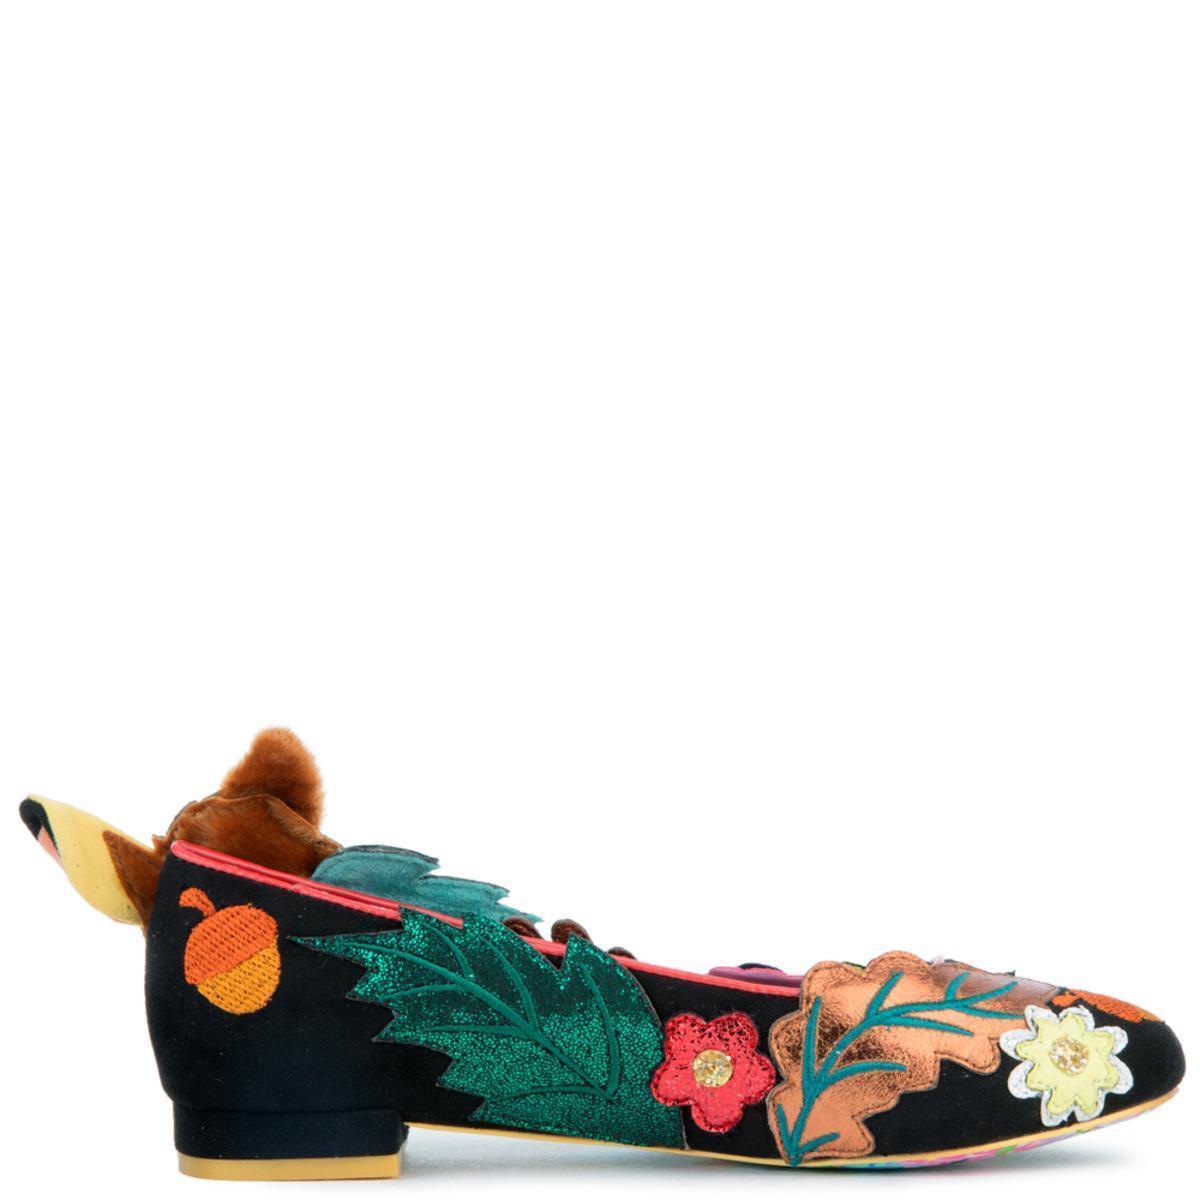 Low Heel Shoes Pink Slip On Flat F Irregular Choice Bow Bow